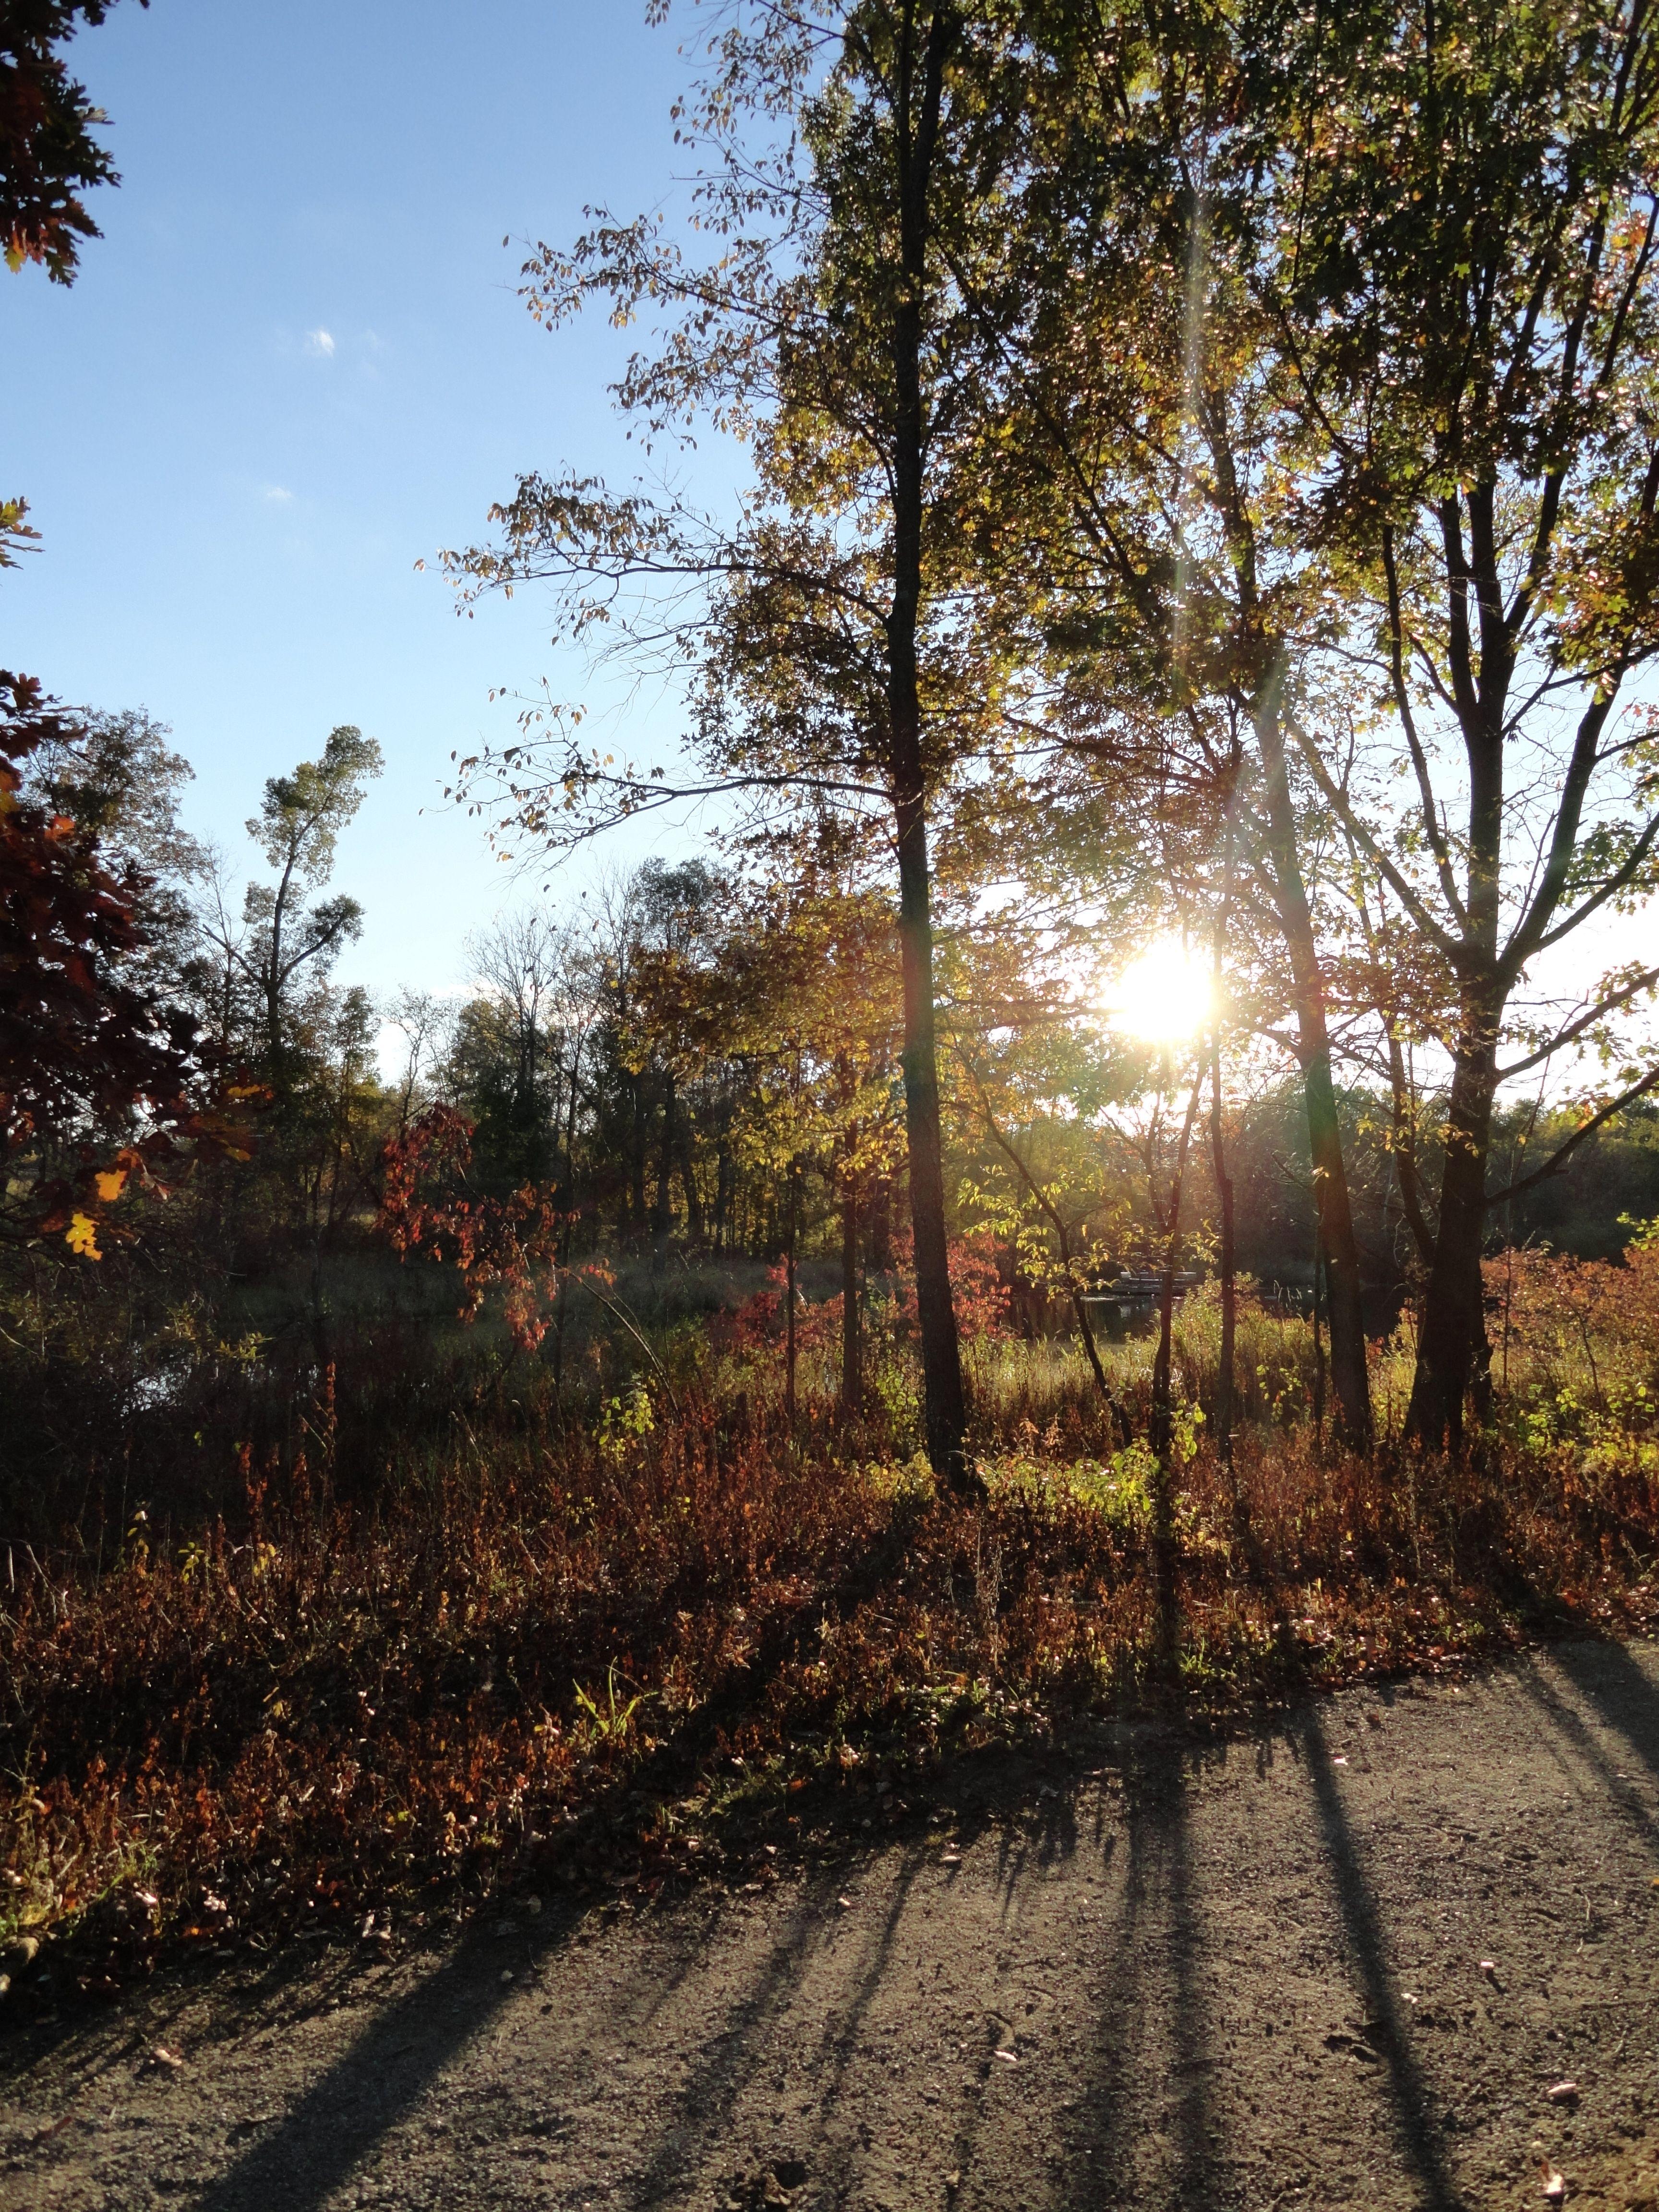 Bear creek park oakland township michigan country